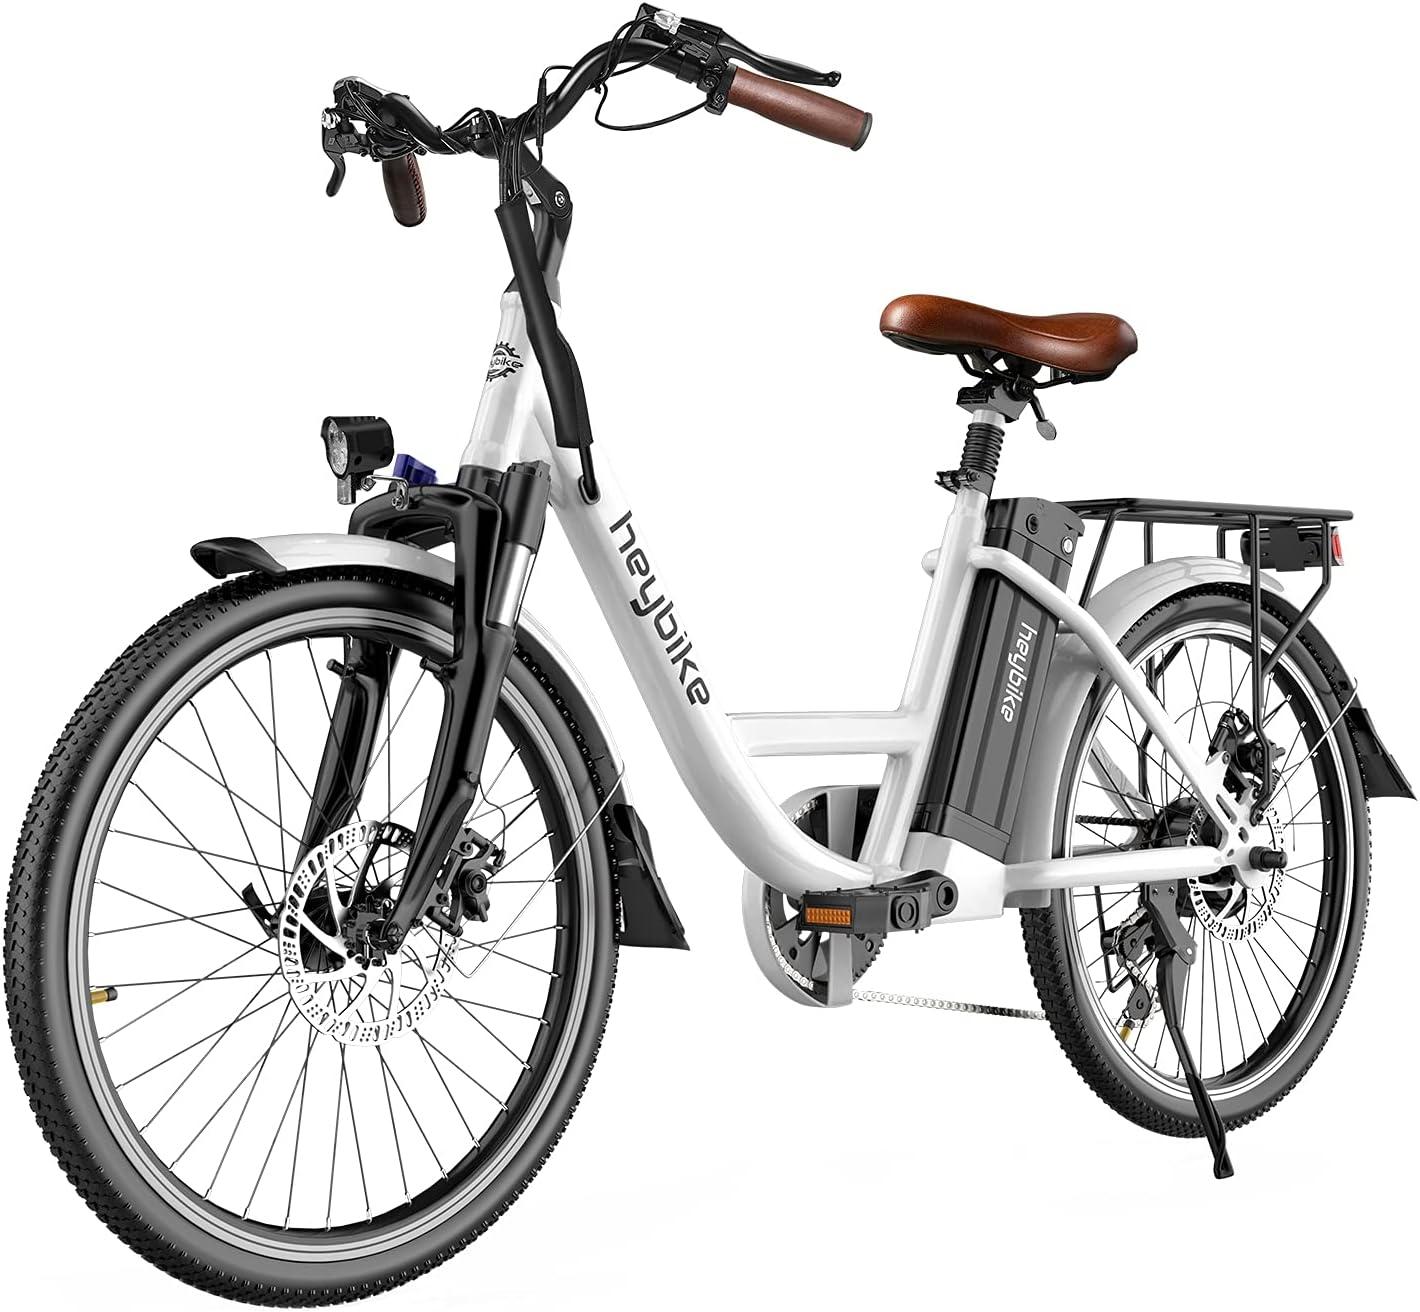 Heybike Cityscape Electric Bike 2021 autumn and winter new City Bicyc 350W Cruiser Popular product